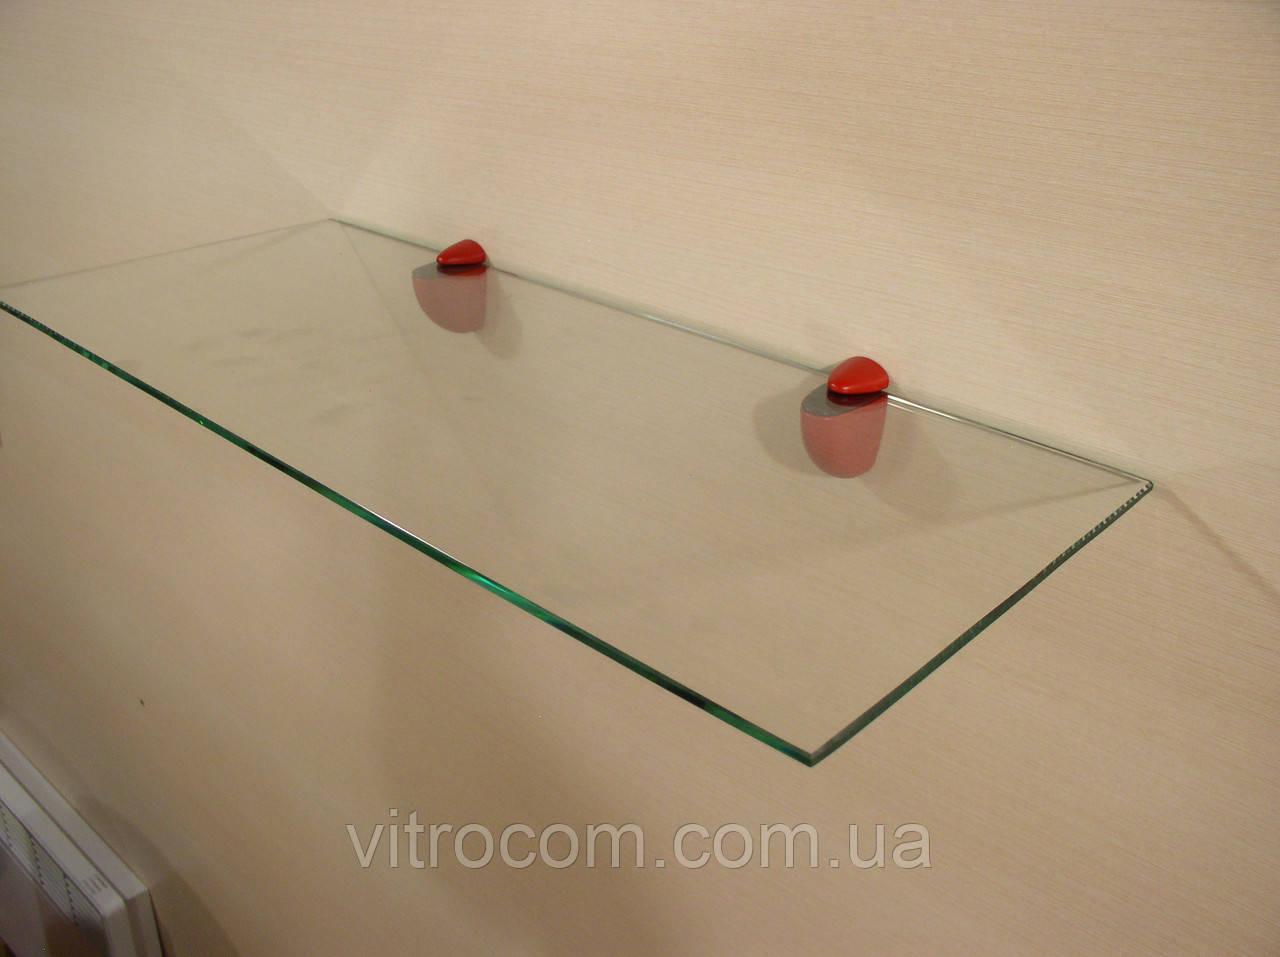 Полка стеклянная прямая 5 мм прозрачная 75 х 25 см